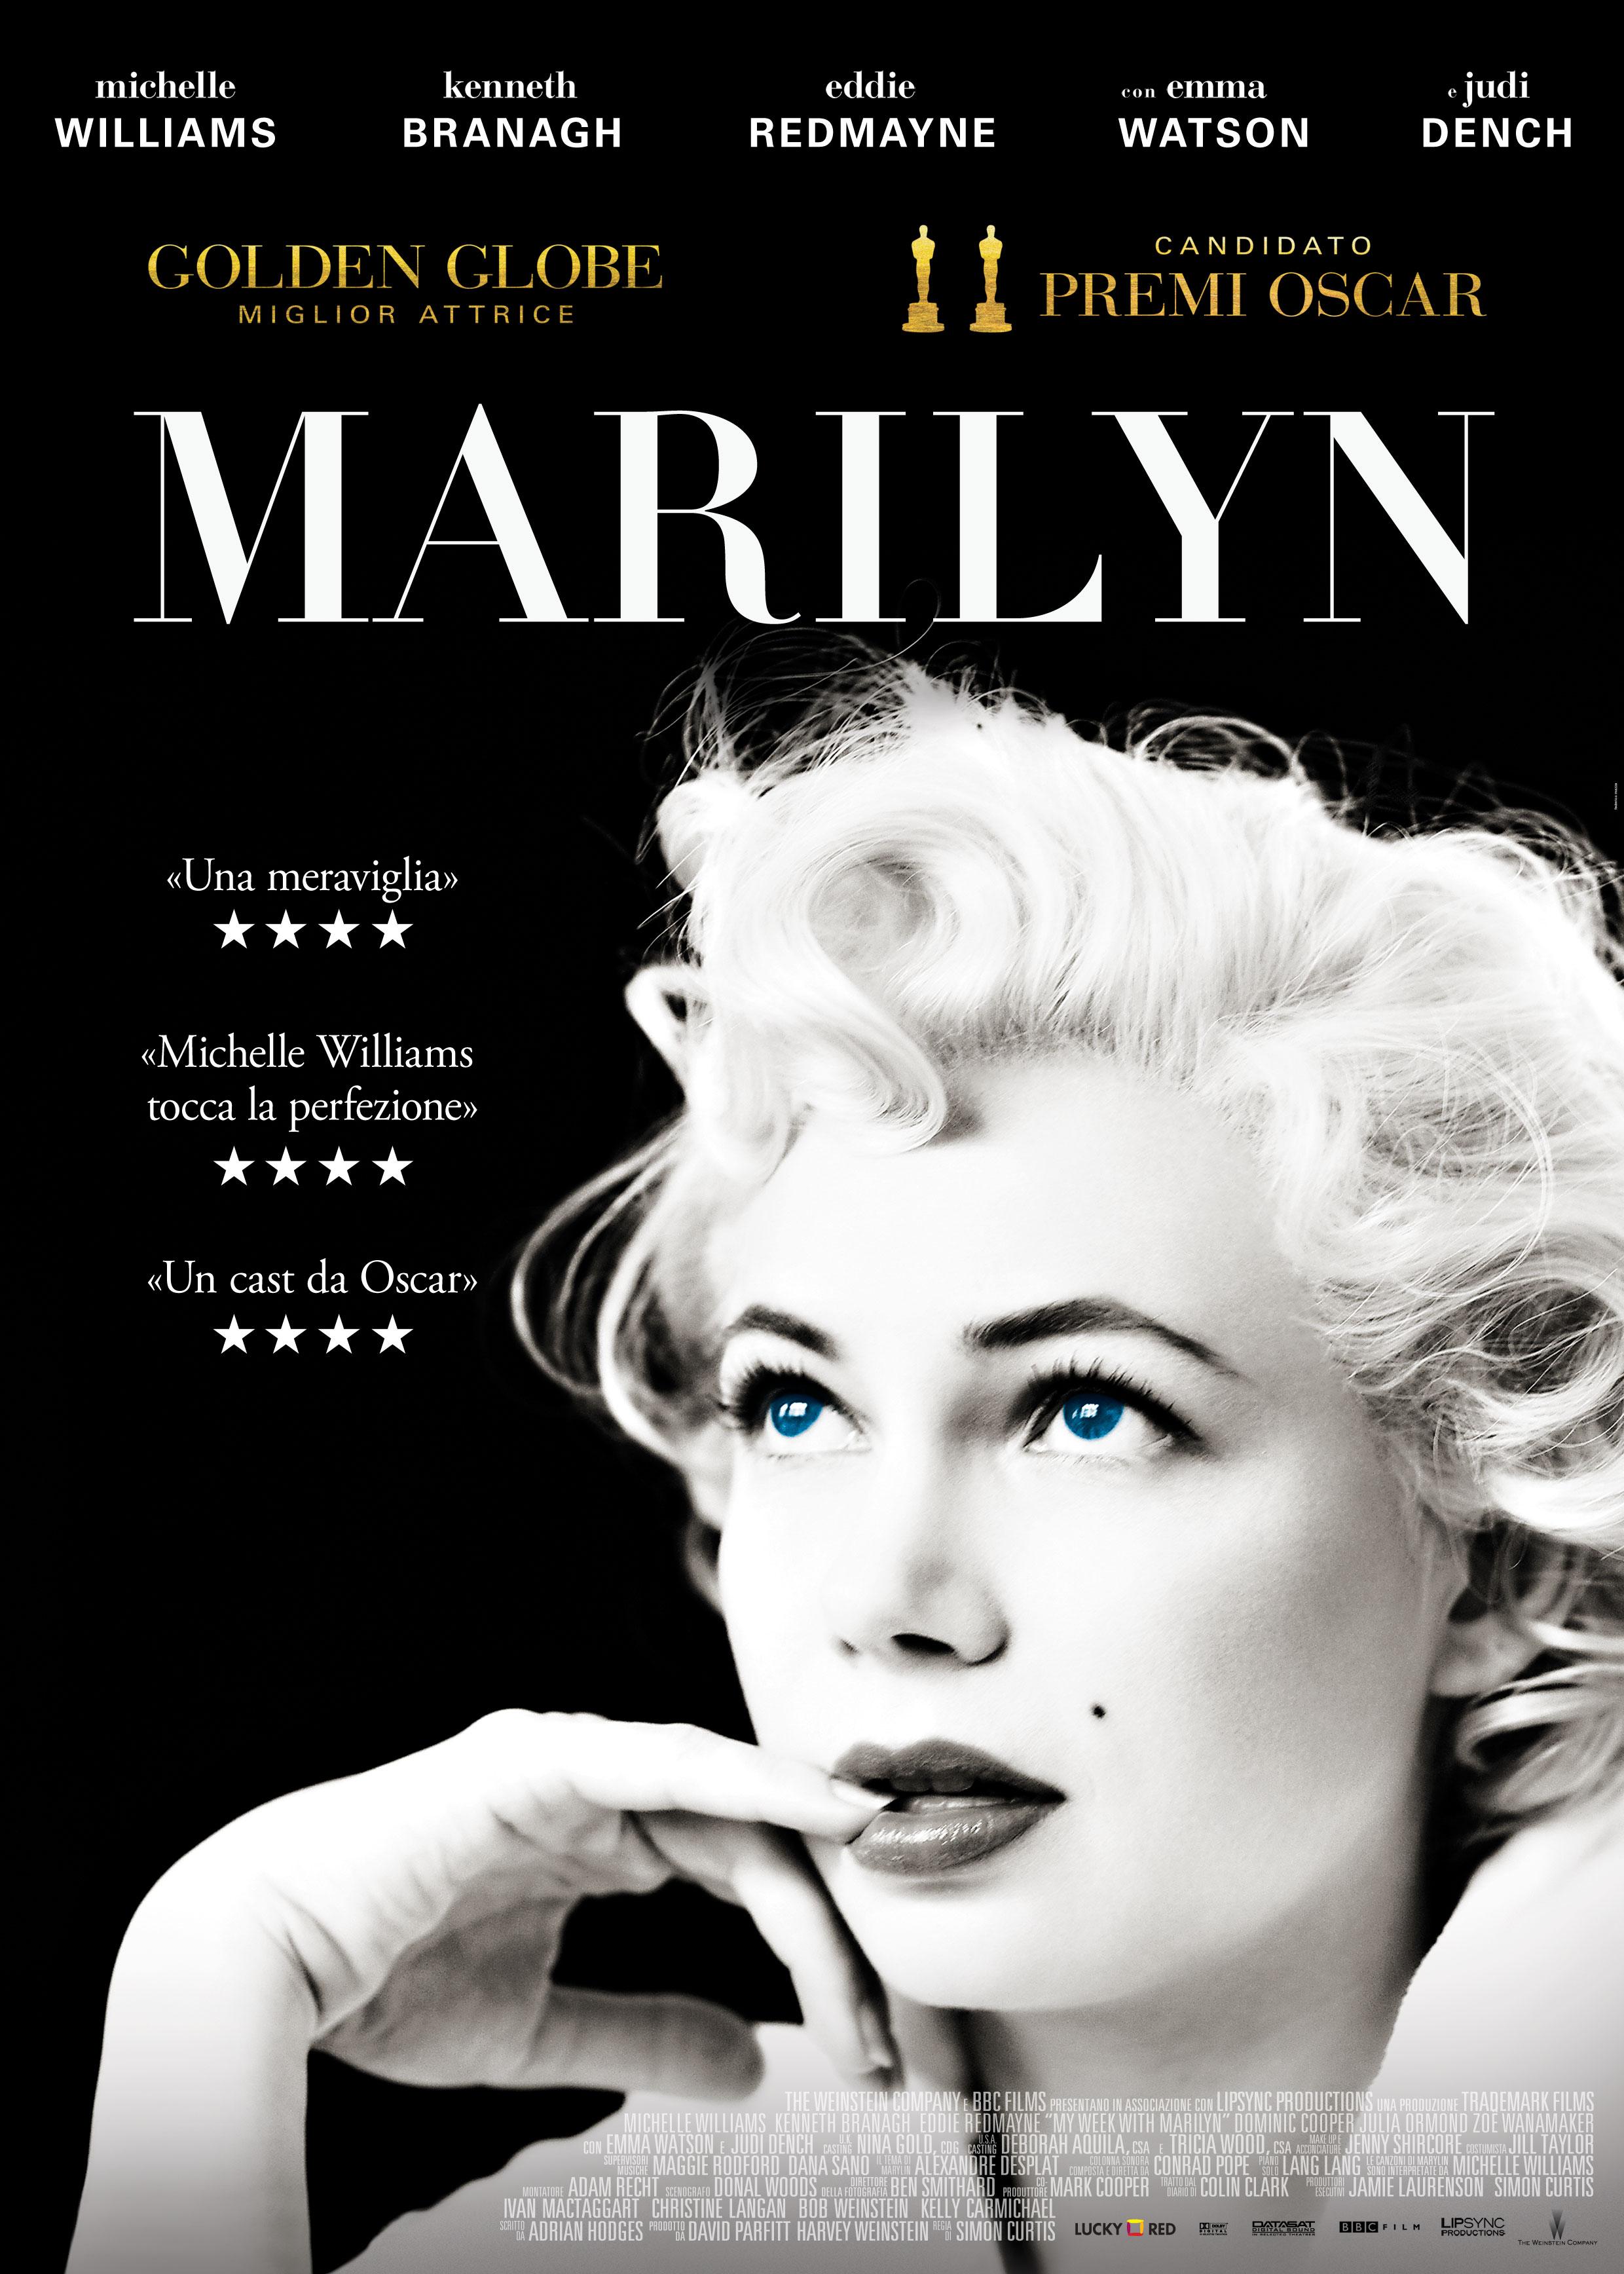 Marilyn Monroe Filme